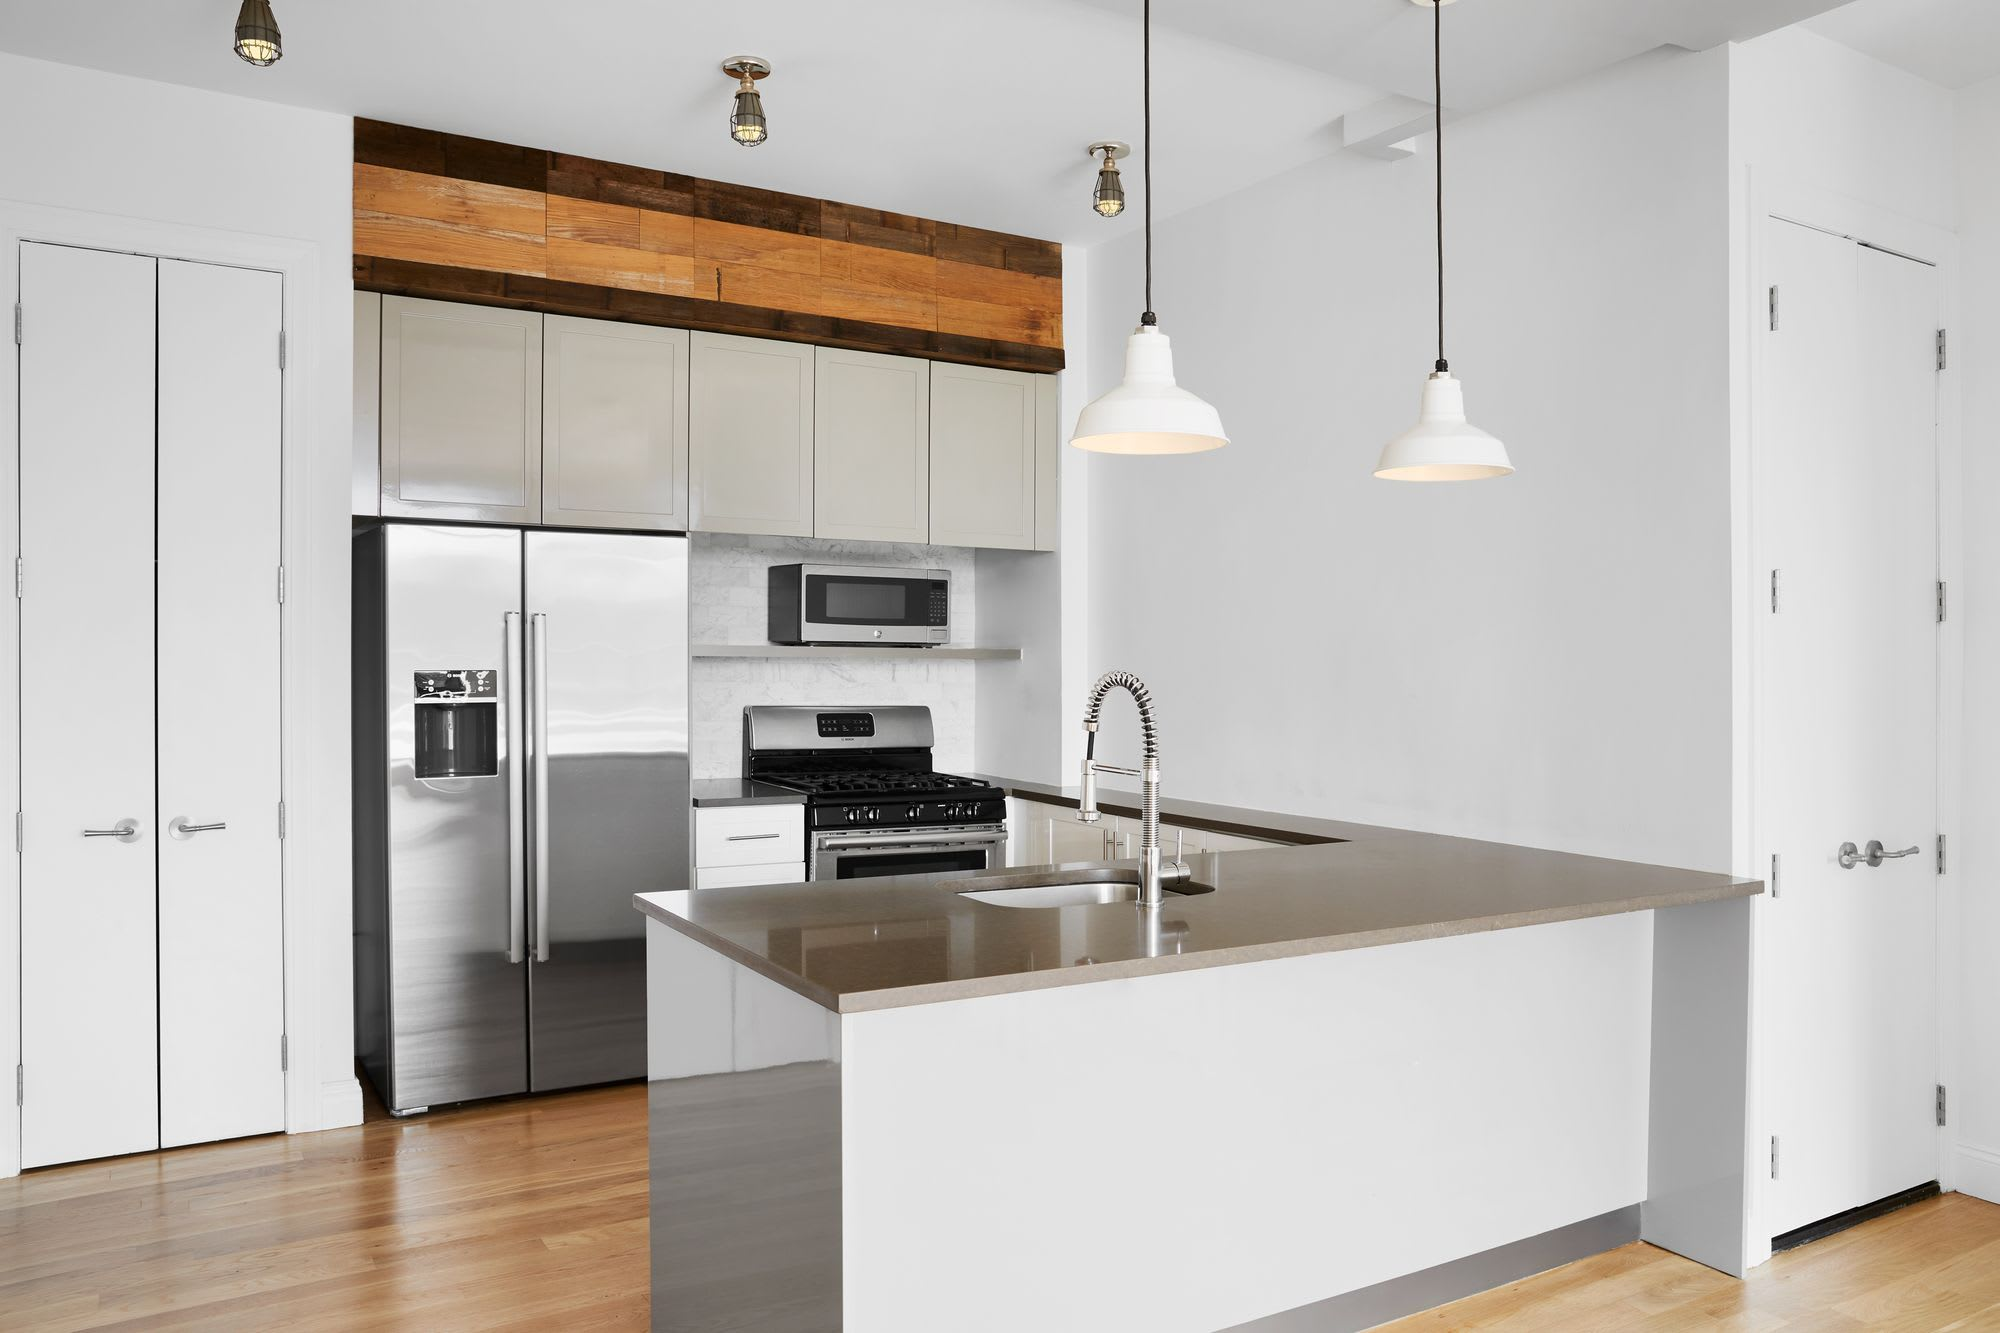 Craigslist Basement For Rent In Brooklyn : Craigslist ...